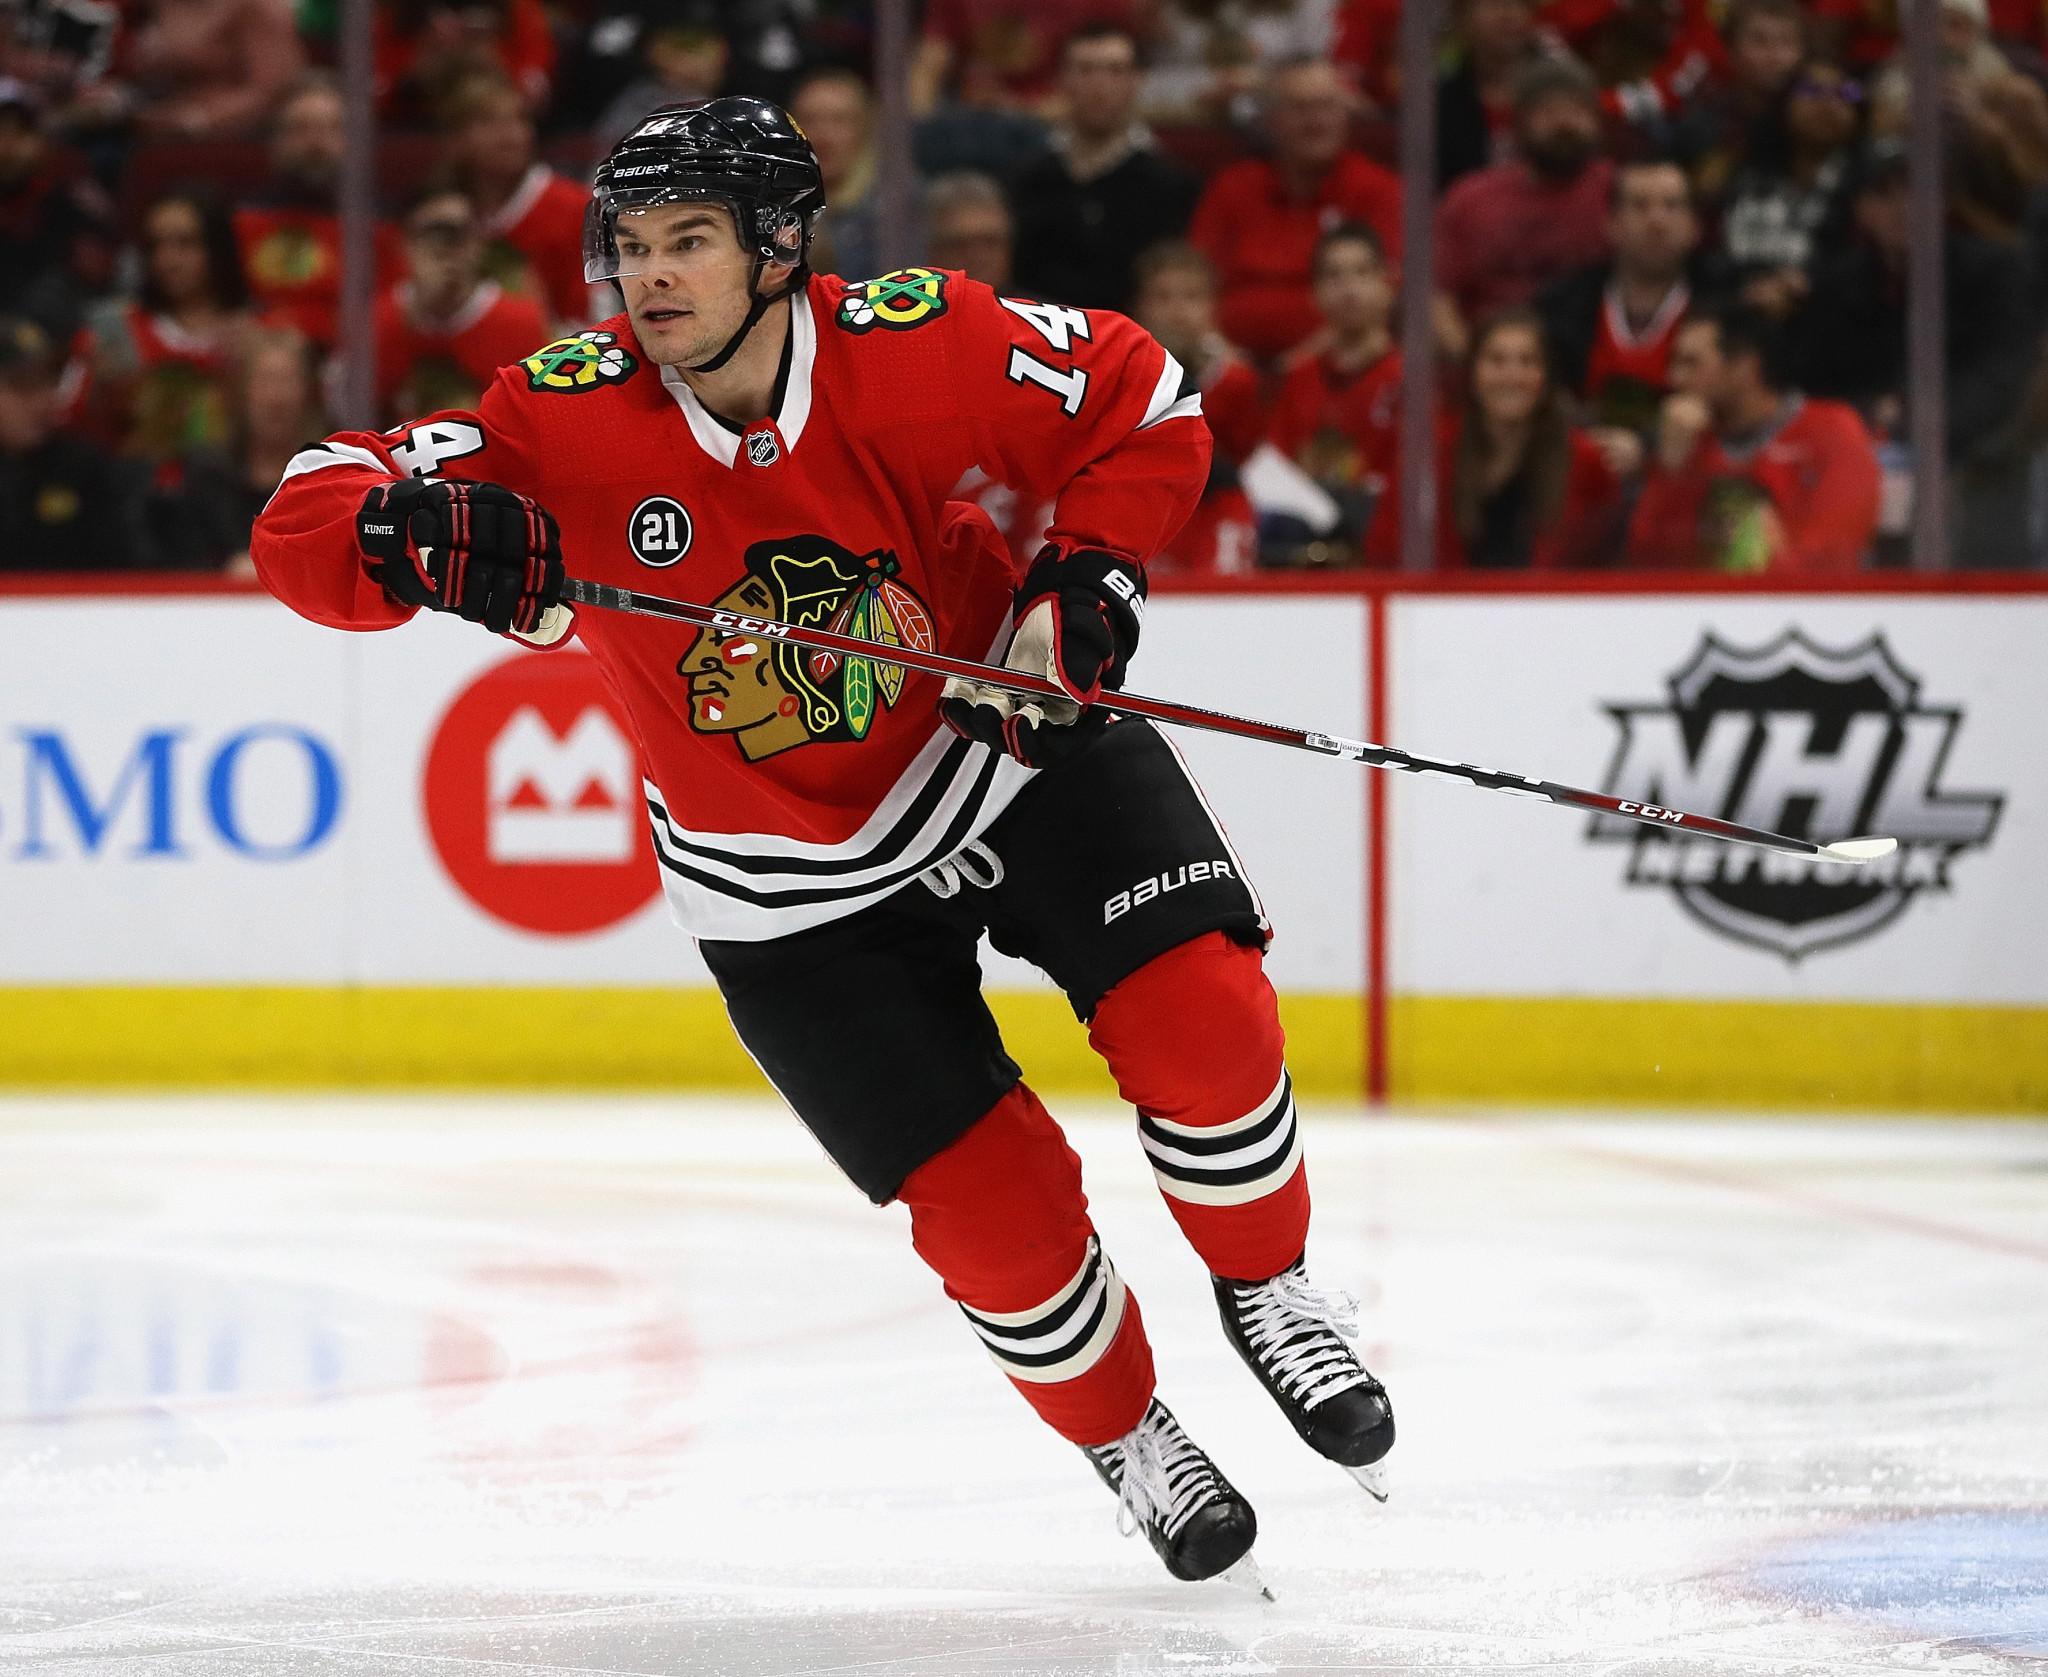 Olympic ice hockey gold medallist Kunitz announces retirement